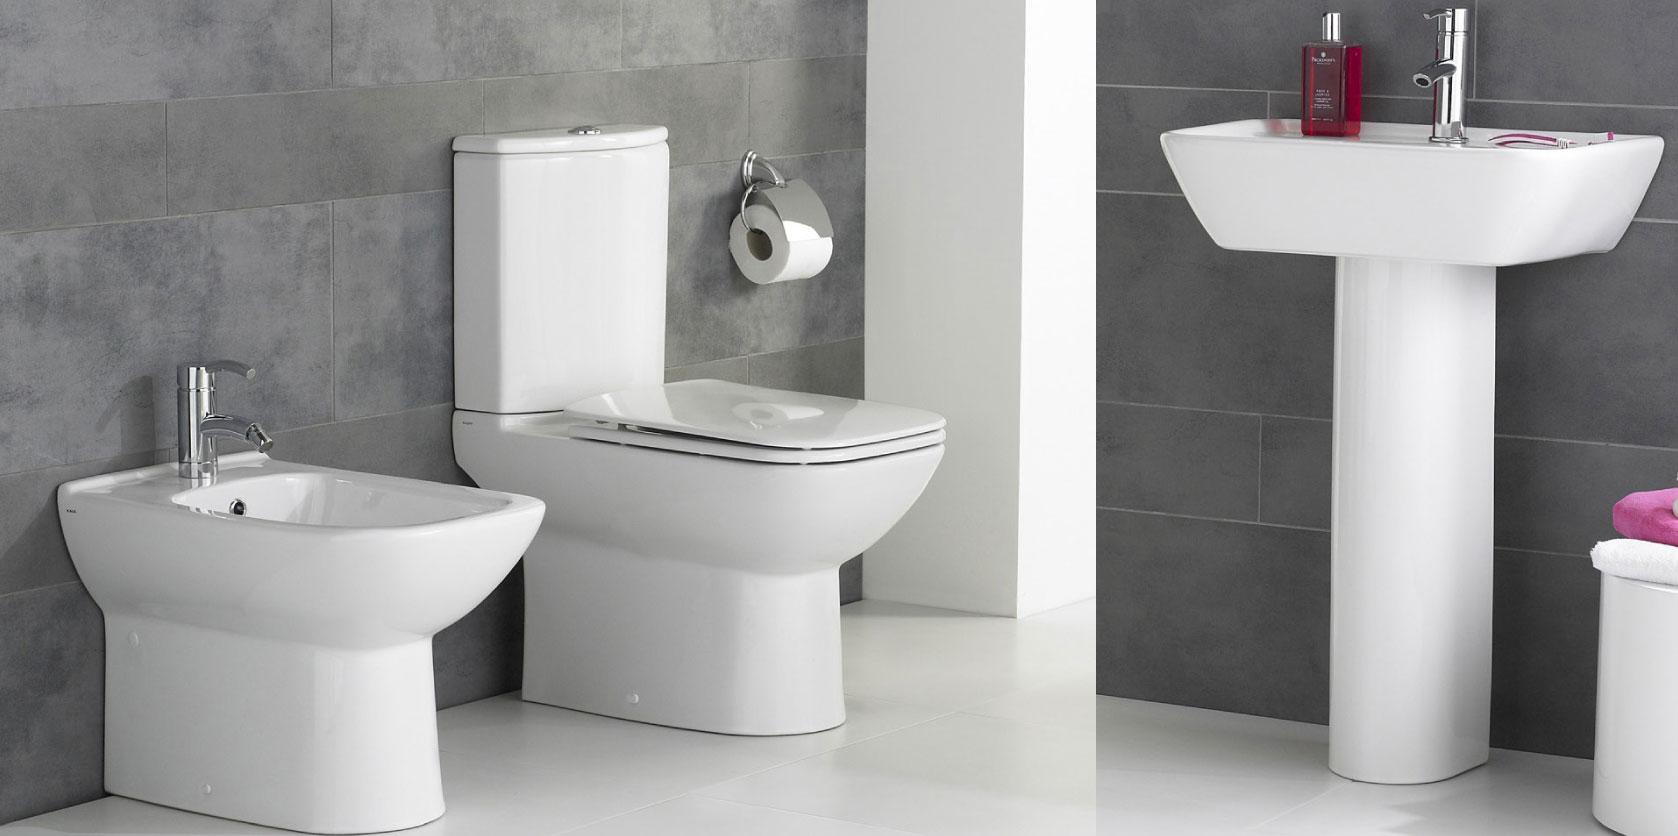 صورة اطقم حمامات , احدث موديلات ادوات صحيه 6198 1